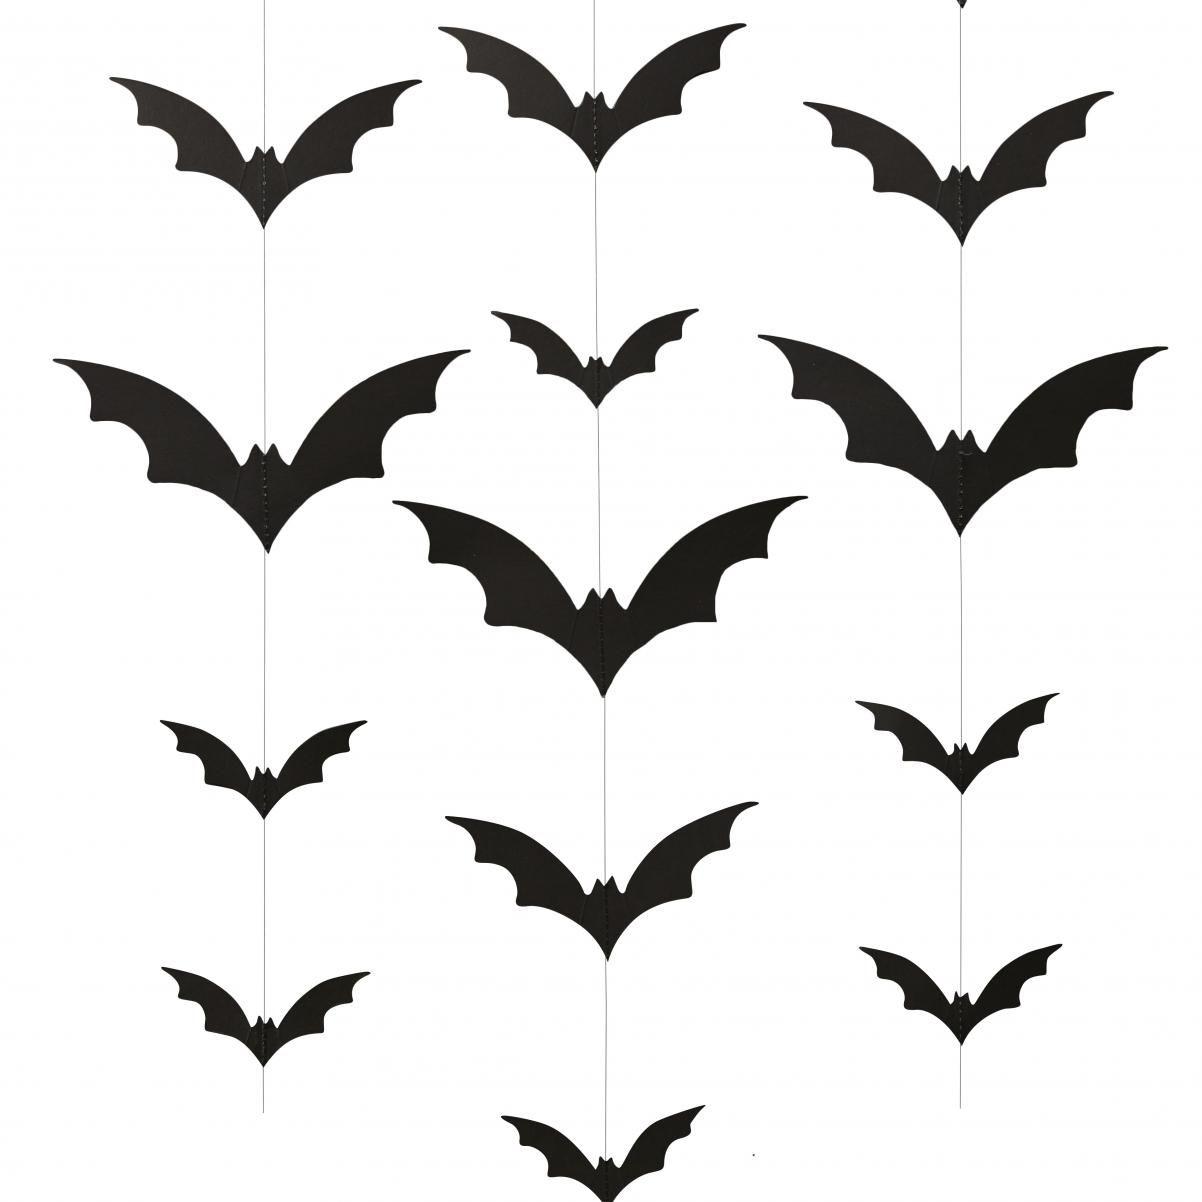 6 Vertikale Fledermaus Girlanden Halloween Girlande Girlanden Dekoration Girlanden